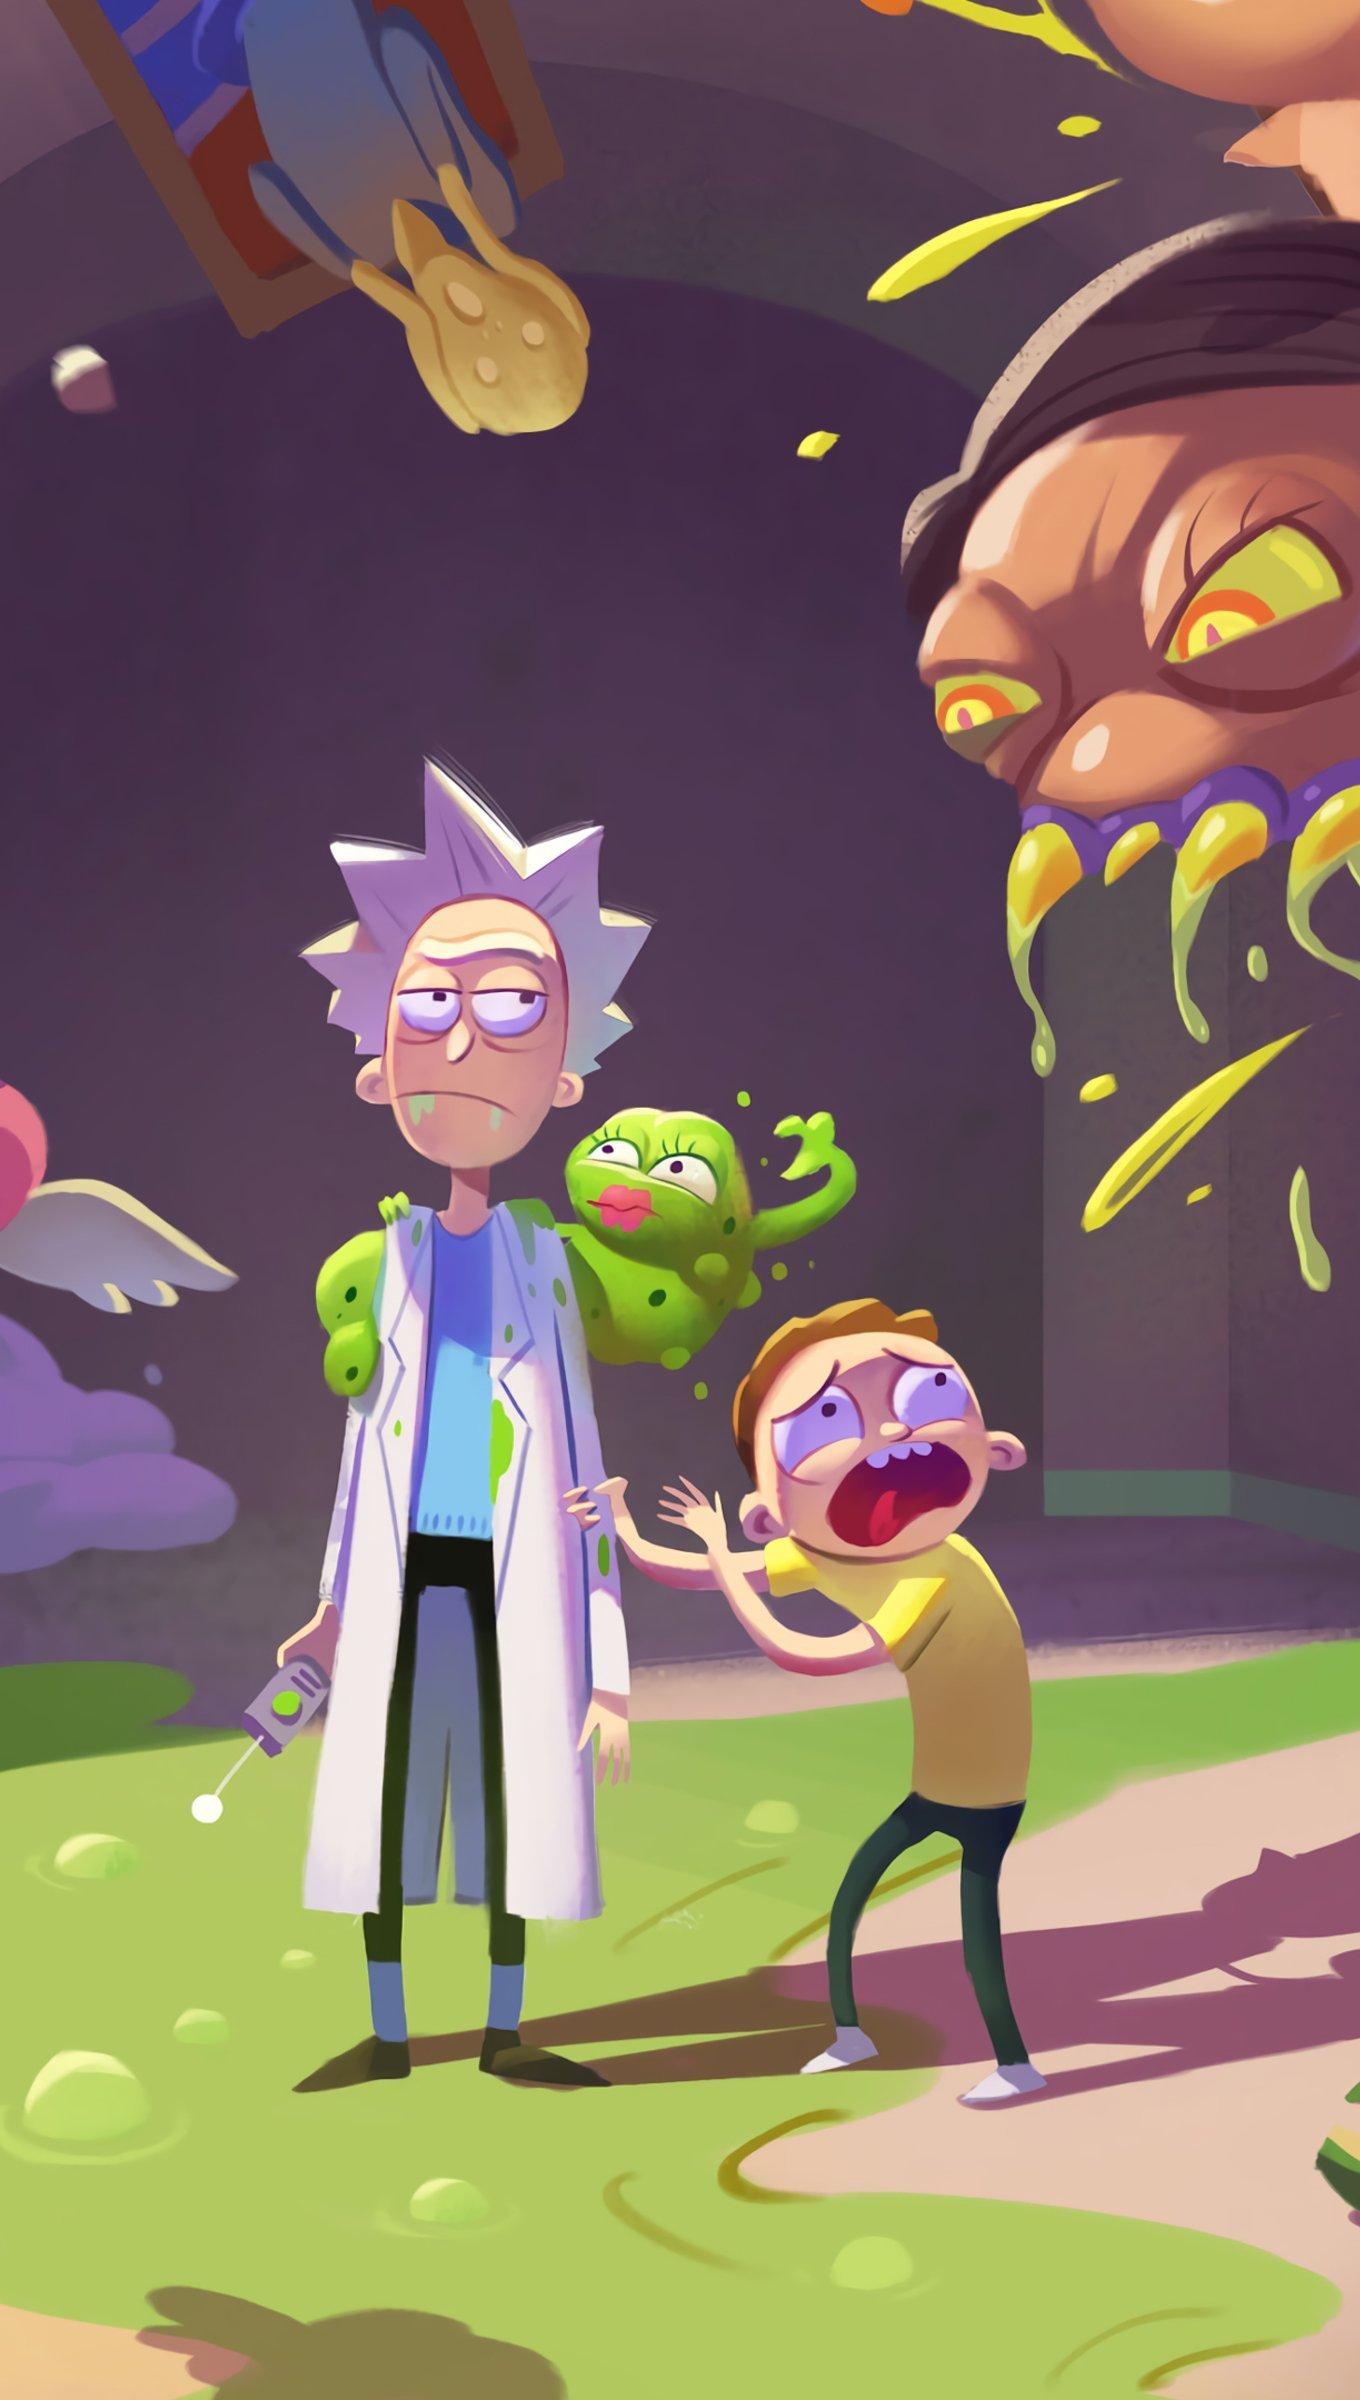 Rick And Morty Season 4 Wallpaper 4k Ultra Hd Id 4114